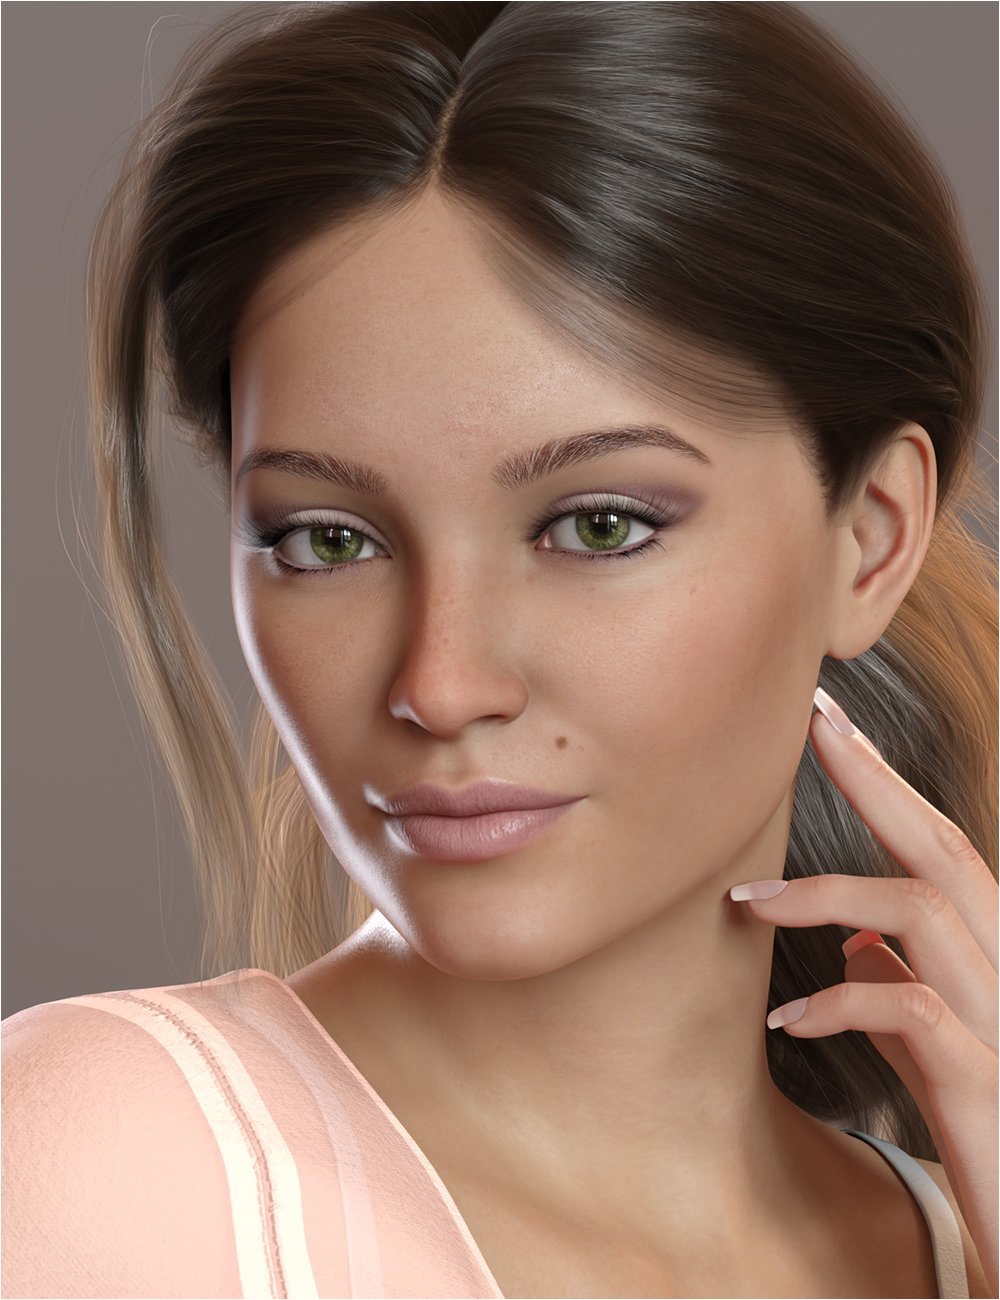 Tahnee for Genesis 8.1 Female by: OziChick, 3D Models by Daz 3D